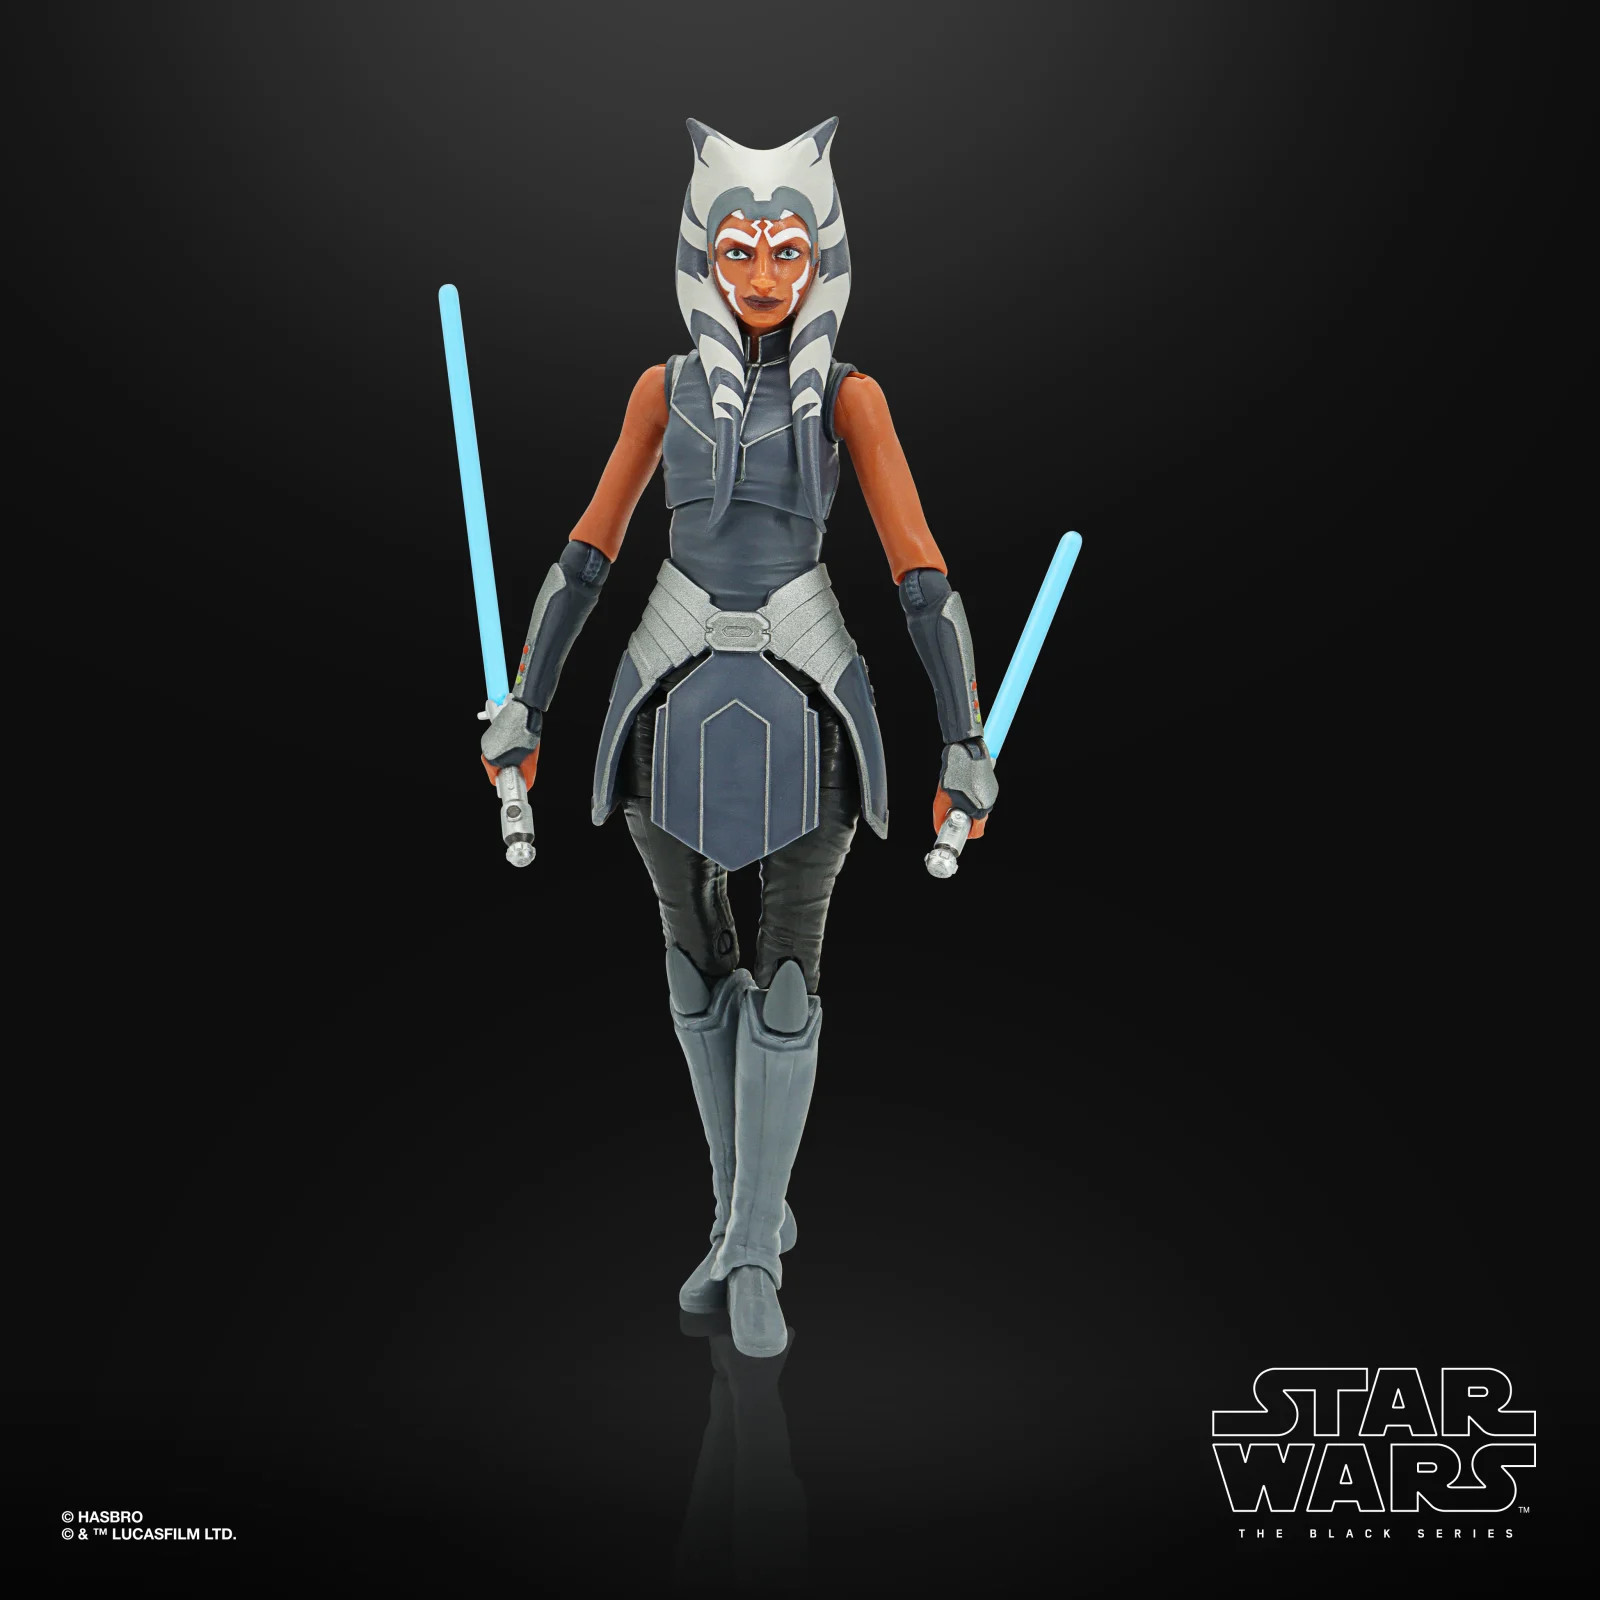 Hasbro-Star-Wars-Black-Series-Clone-Wars-Final-Season-Ahsoka-Tano-Promo-03.jpg